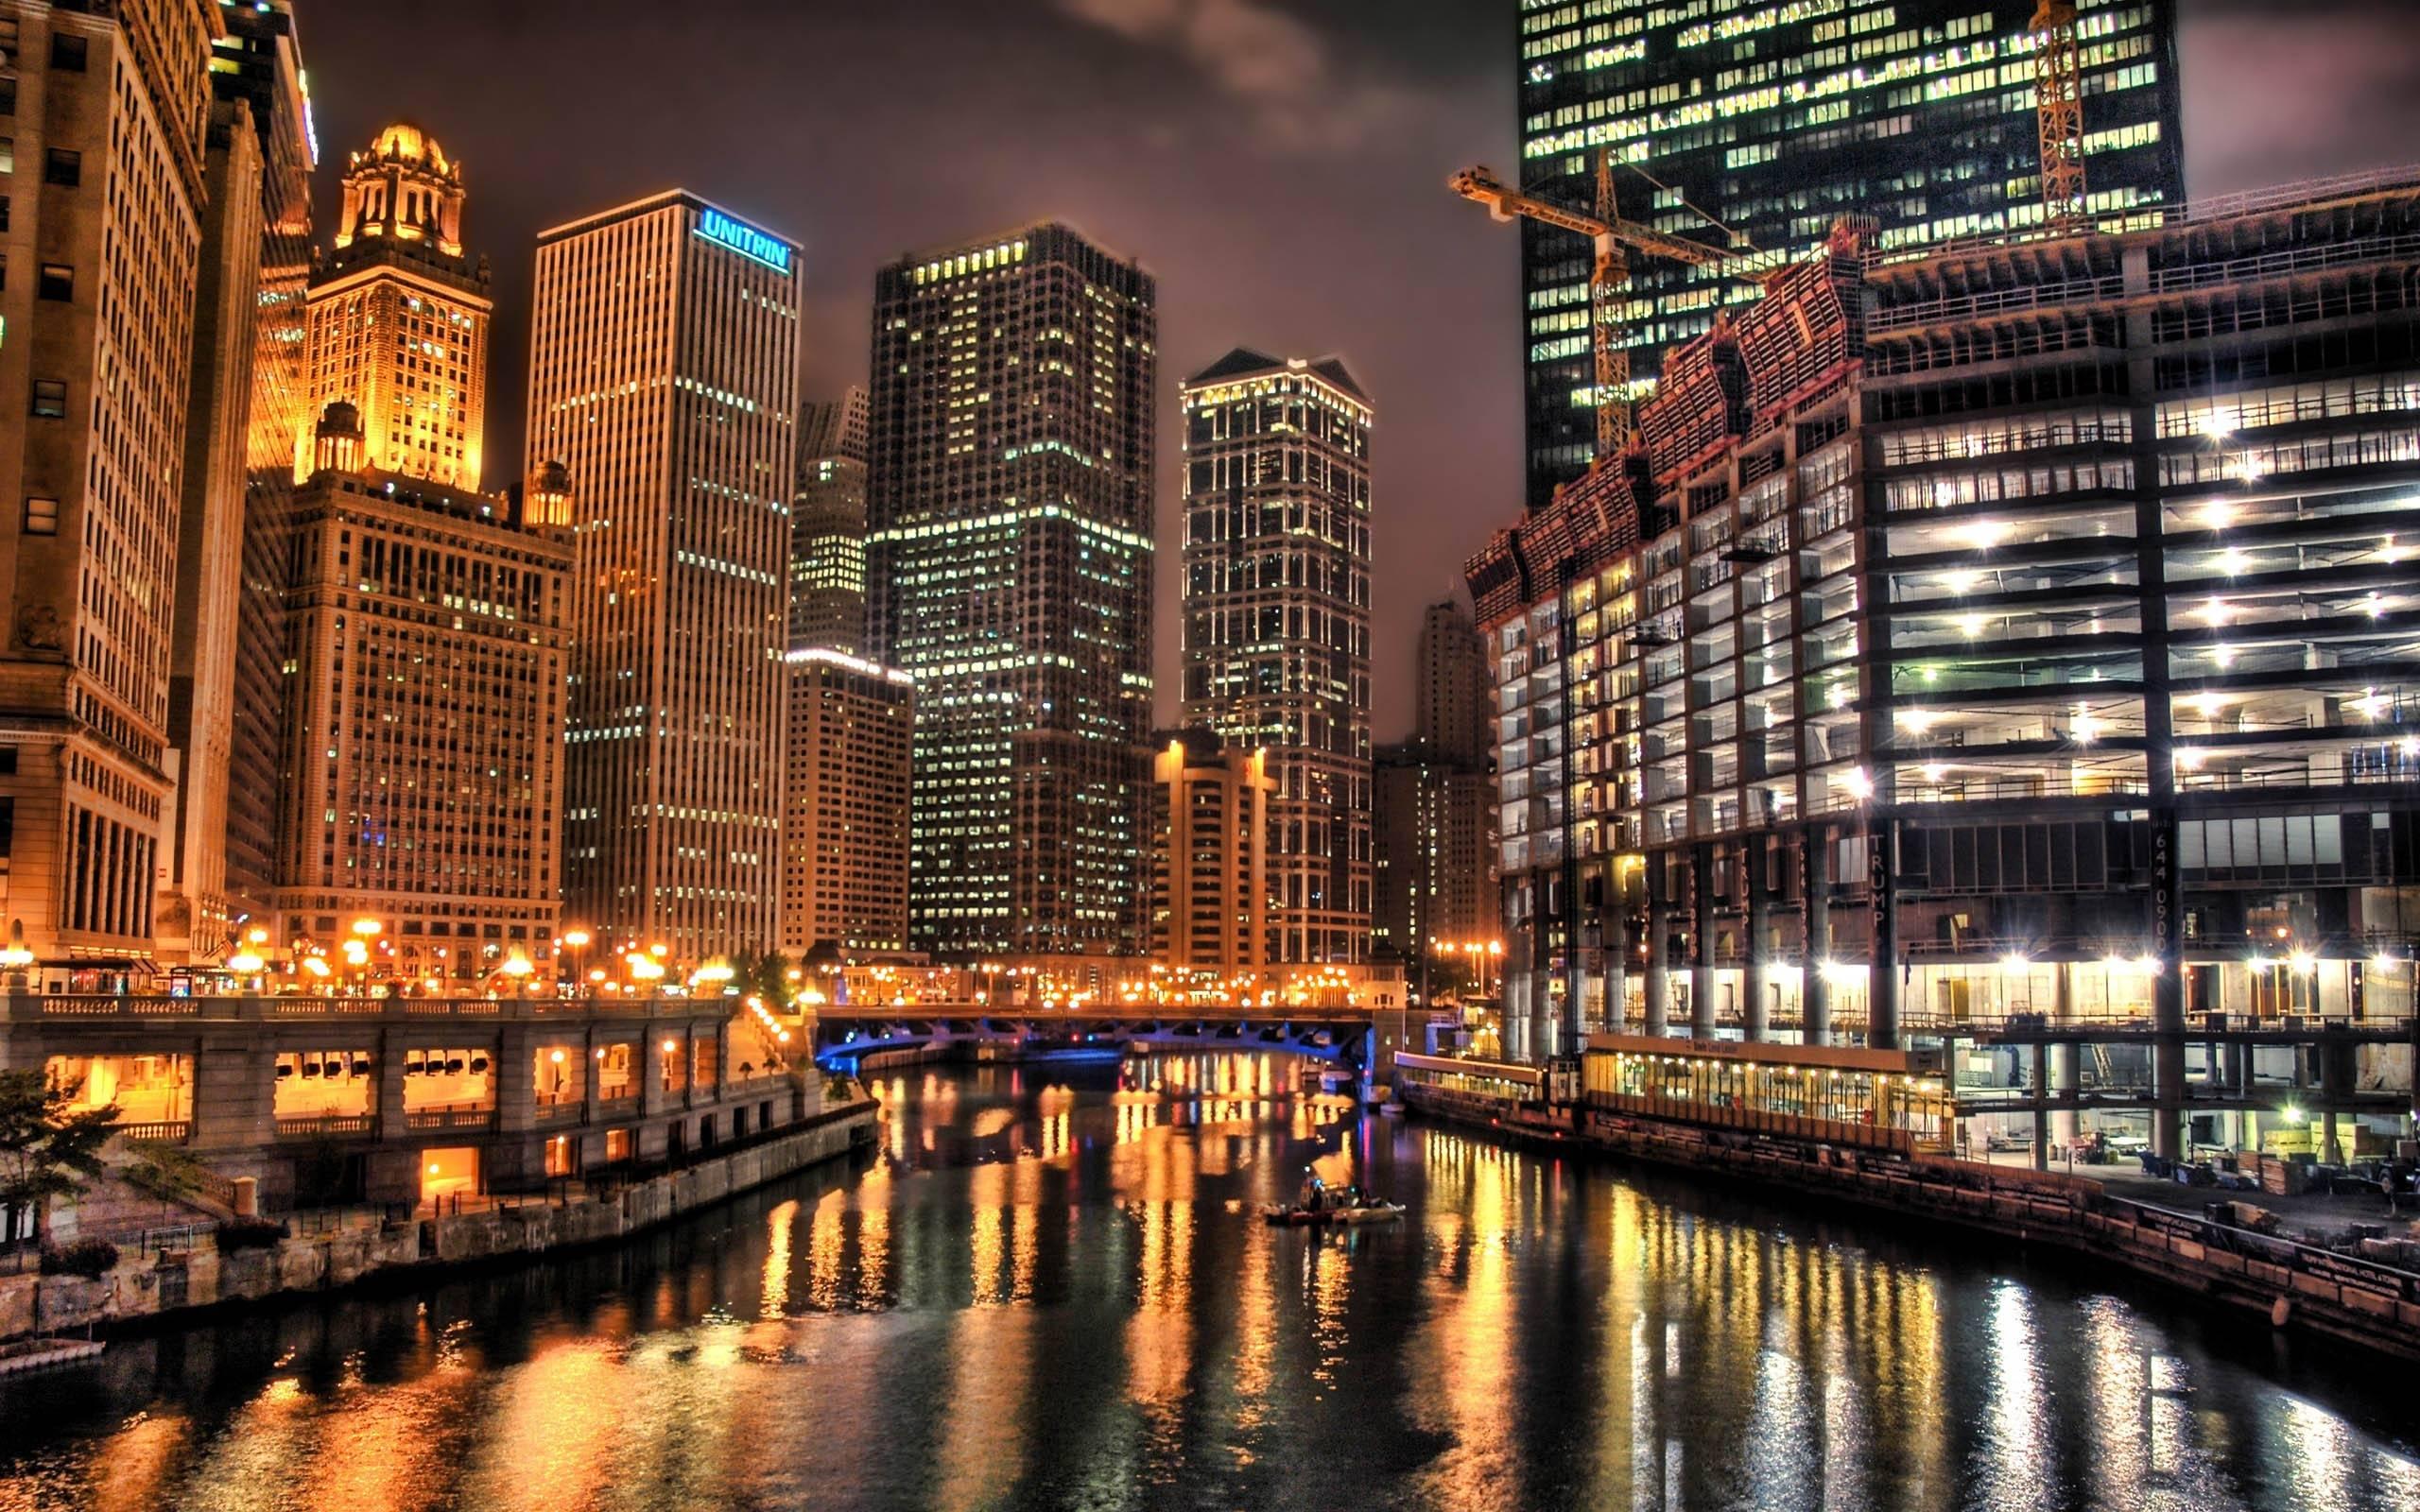 City Lights Hd Wallpaper